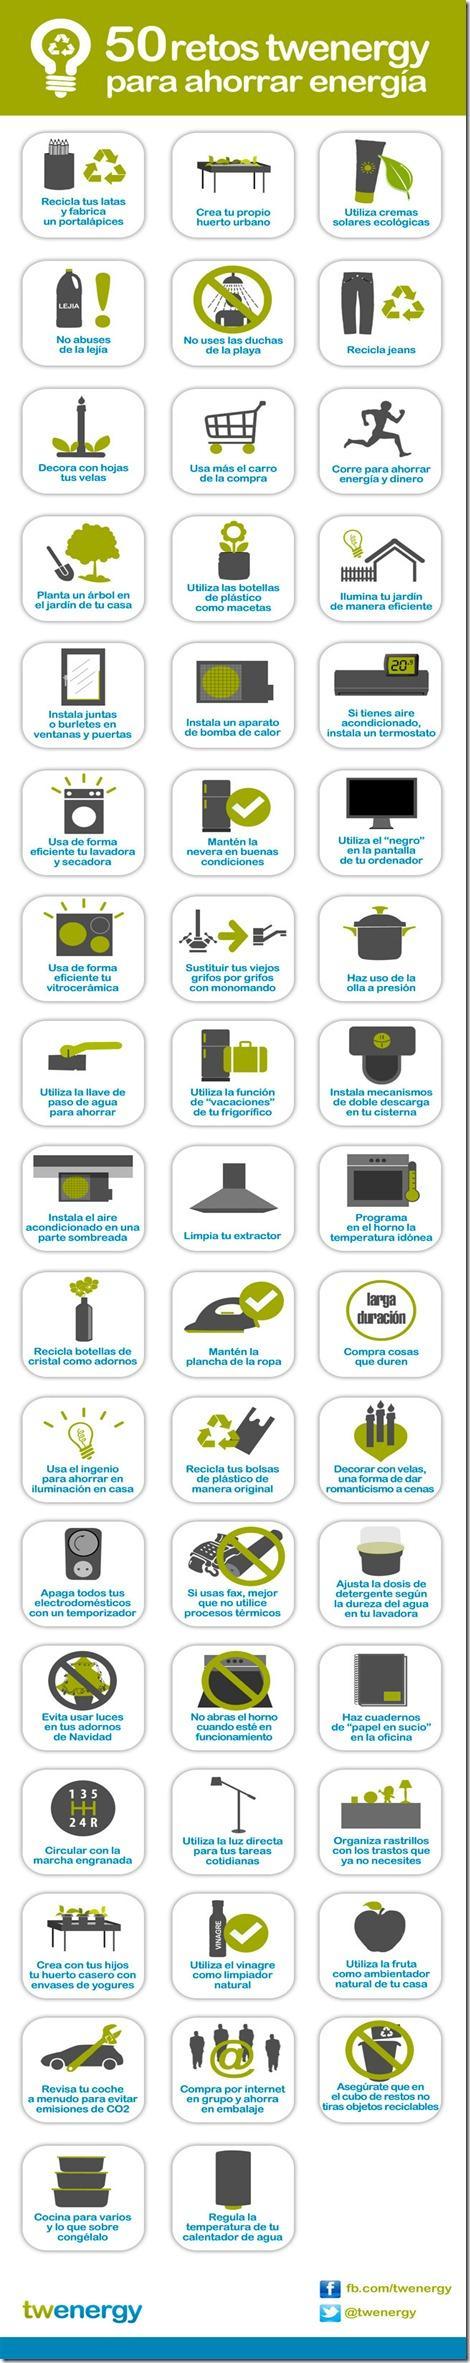 50 consejos para ahorrar energ a paperblog - Como podemos ahorrar agua en casa ...